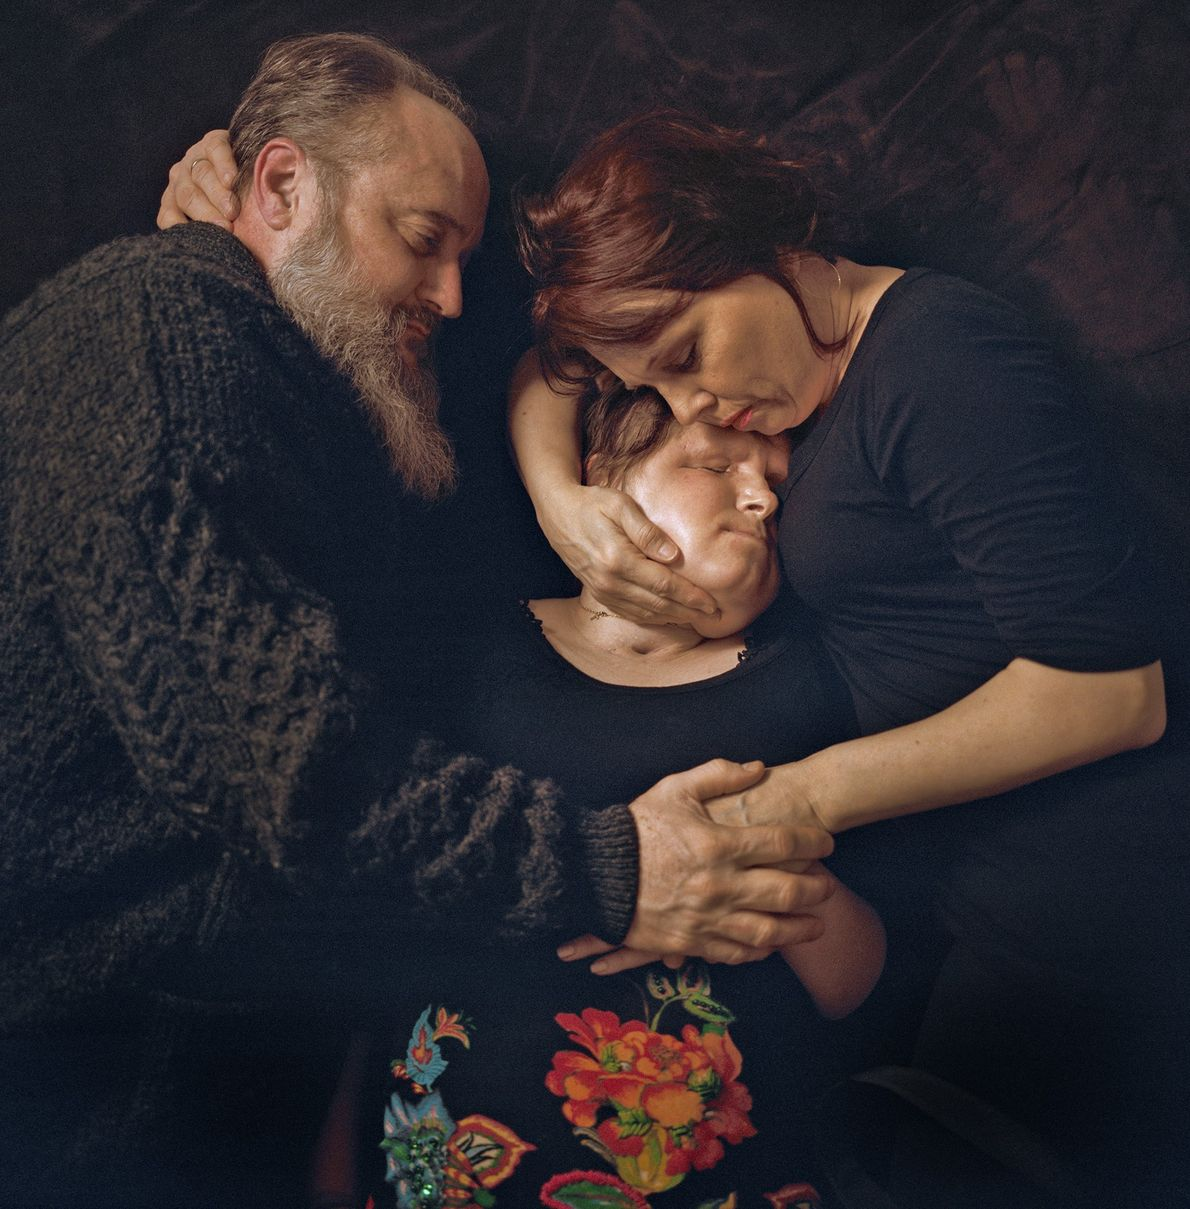 Katie y sus padres